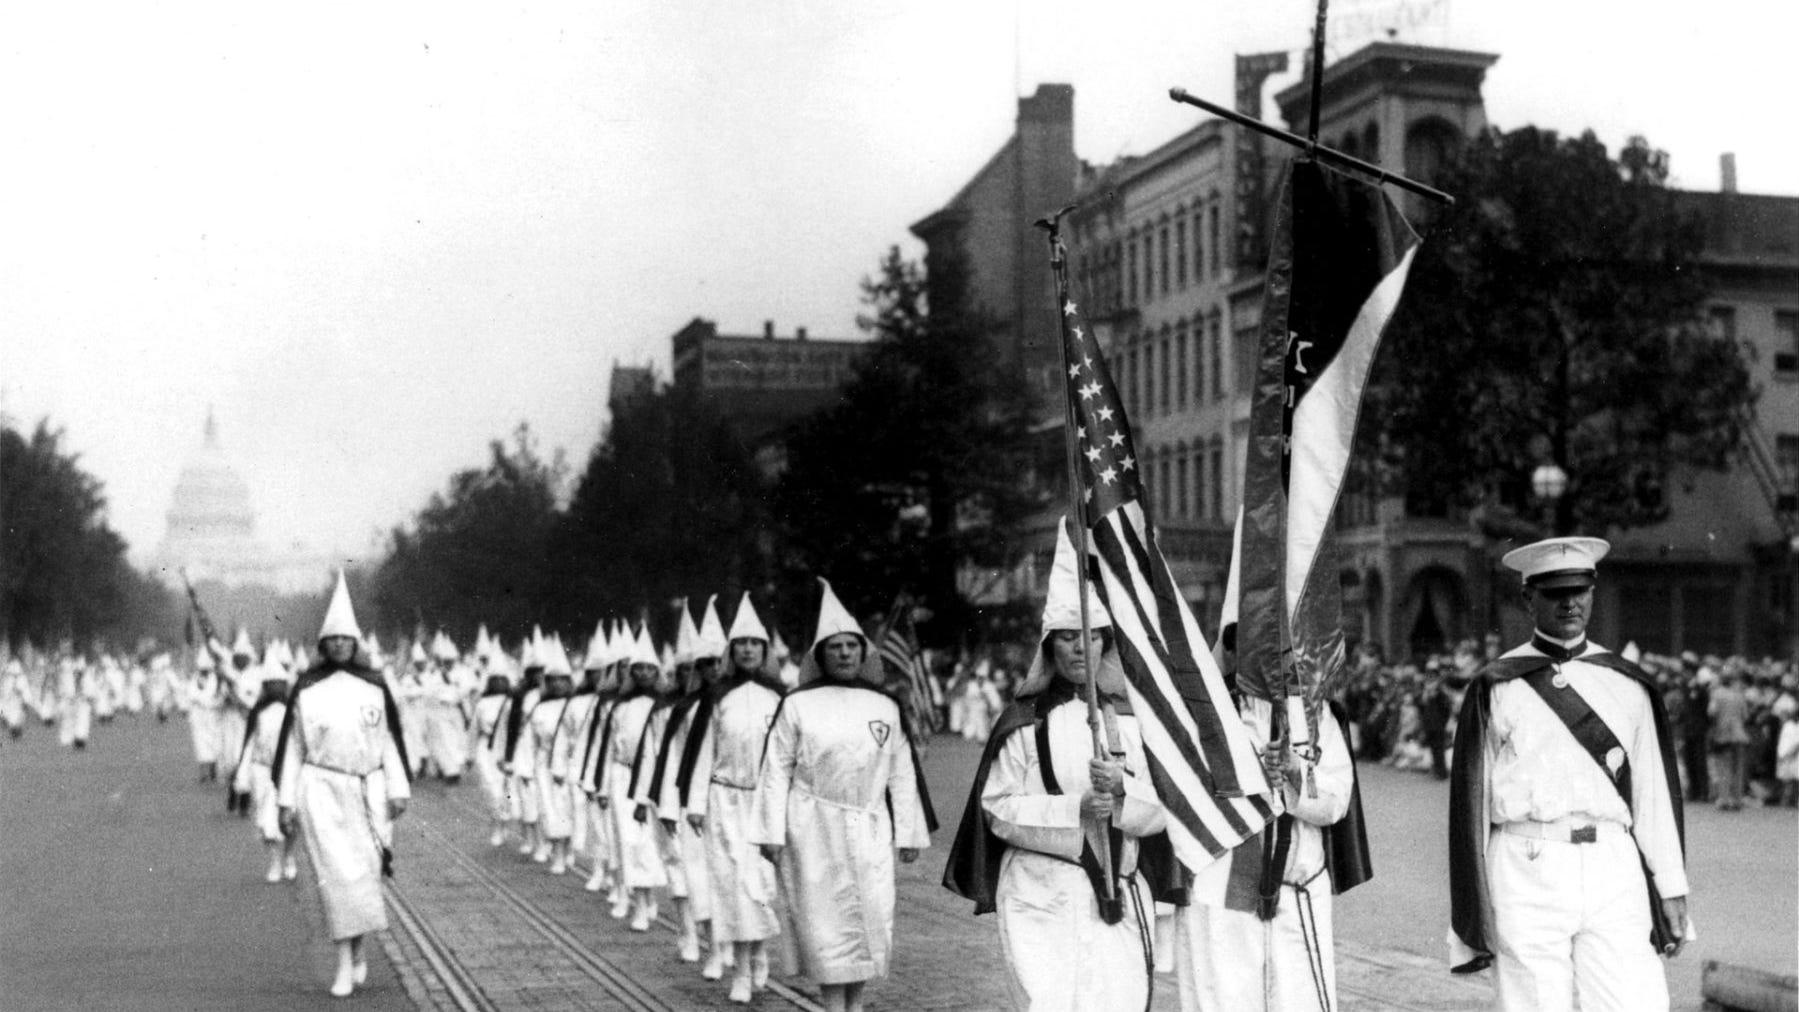 34519f50 38c9 4e18 9c7f 2b4143cd65ab Women of the KKK Getty 1 jpg?crop=1799,1012,x0,y91&width=1799&height=1012&format=pjpg&auto=webp.